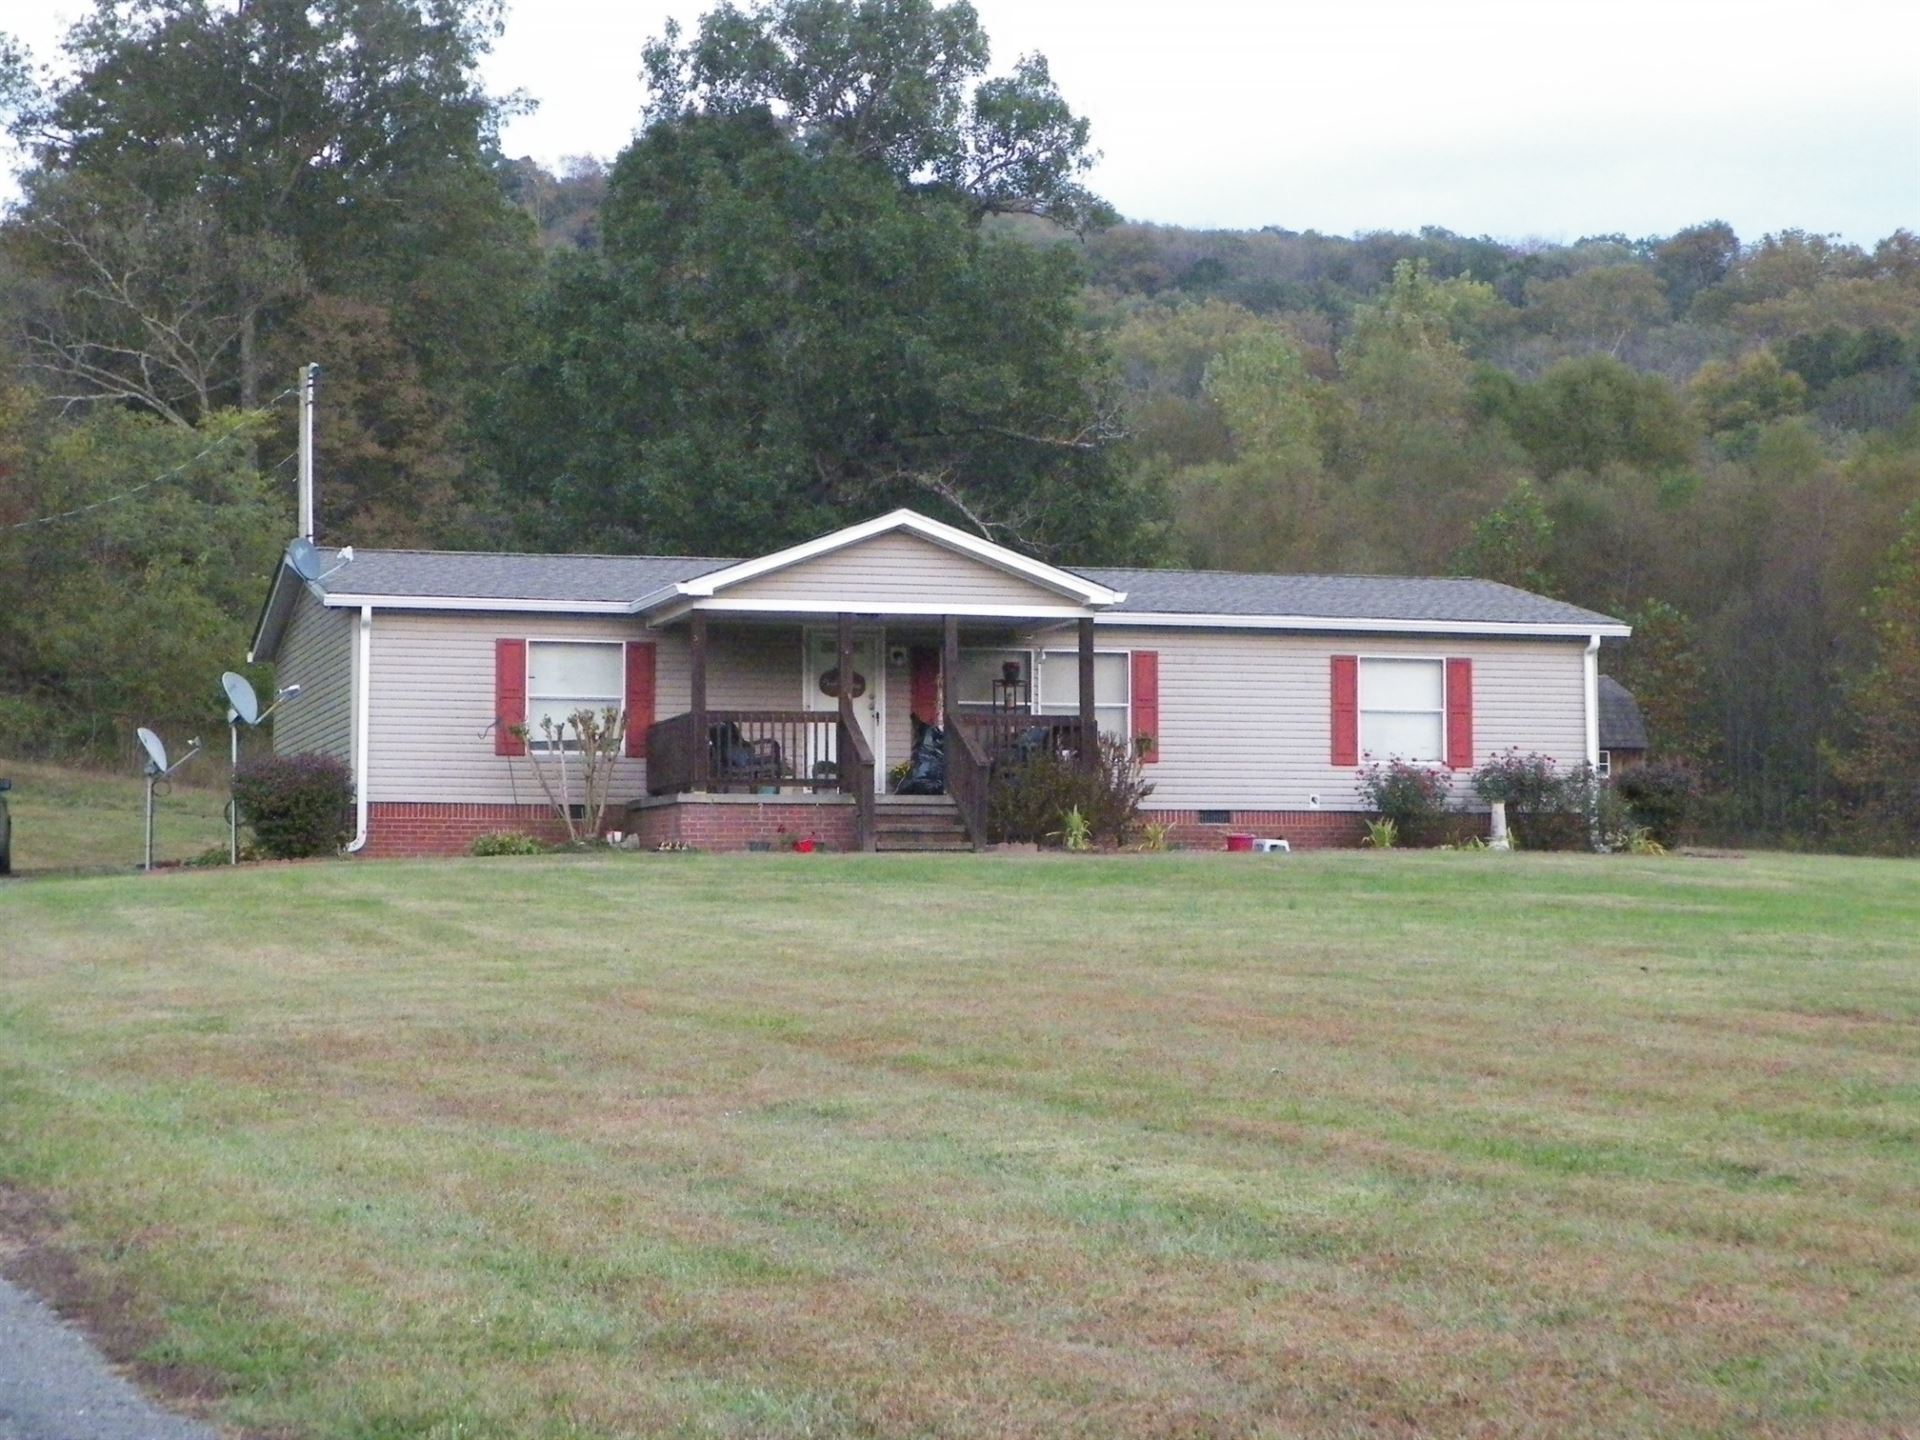 430 Oglesby Rd, Hartsville, TN 37074 - MLS#: 2199691